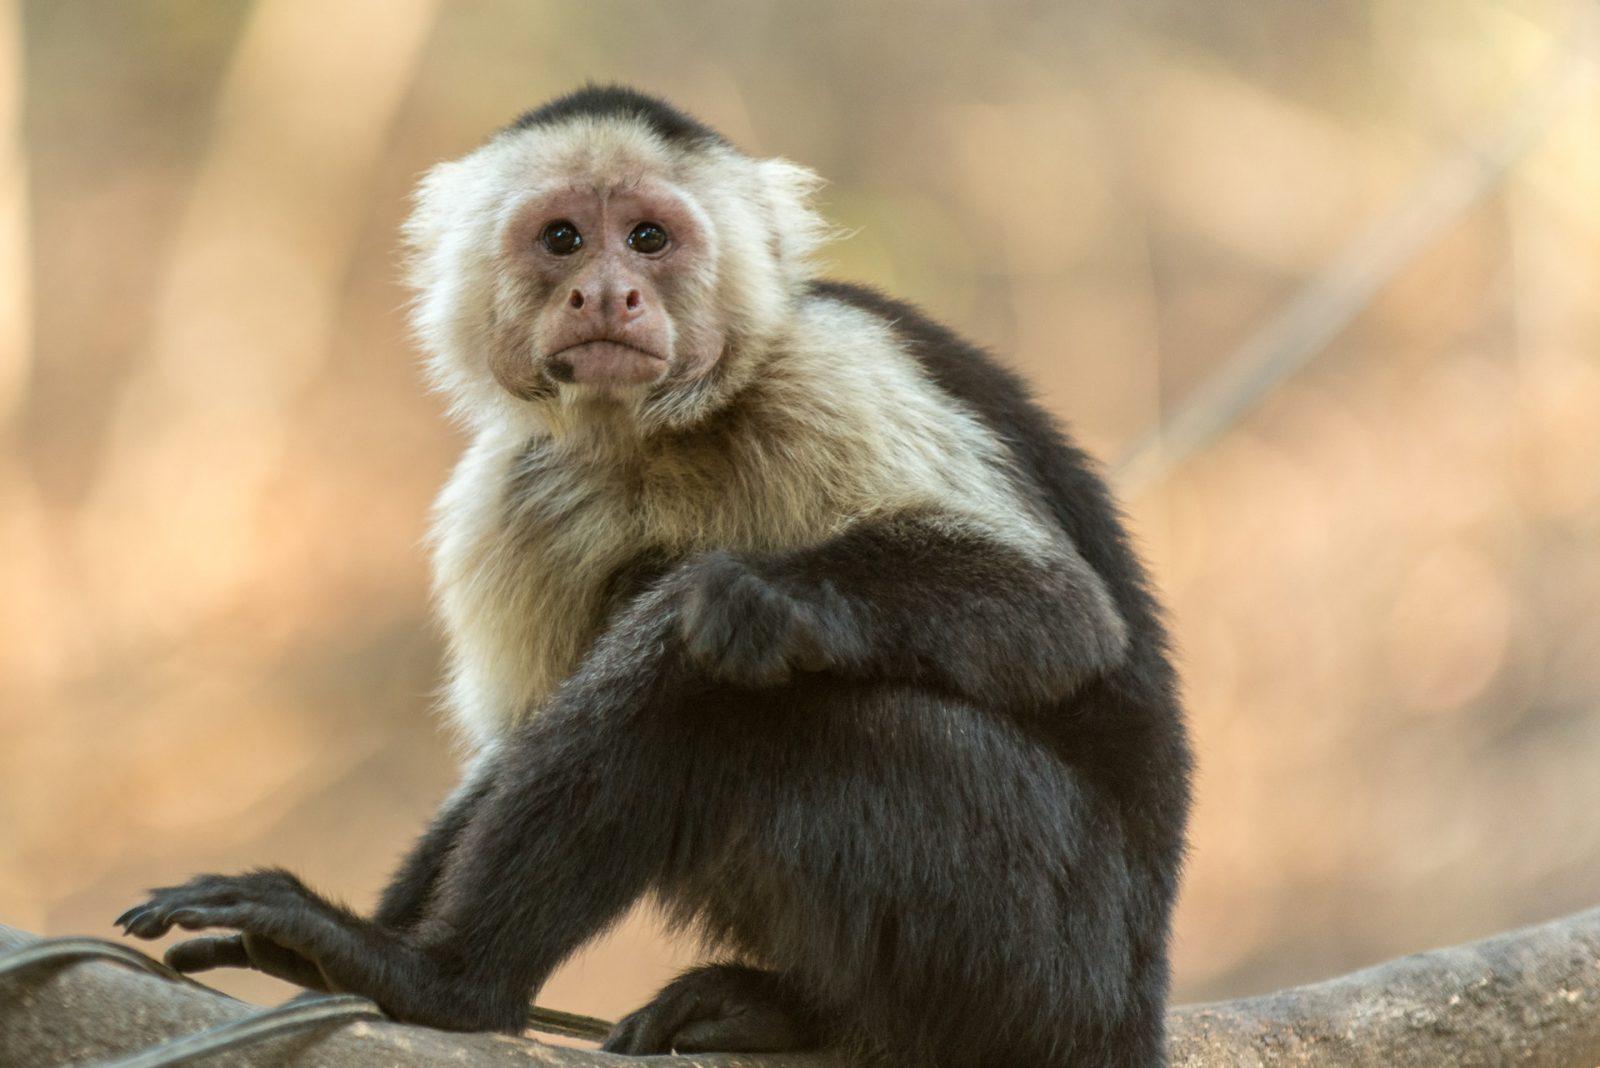 Macaco tem comportamento curioso e surpreendente.